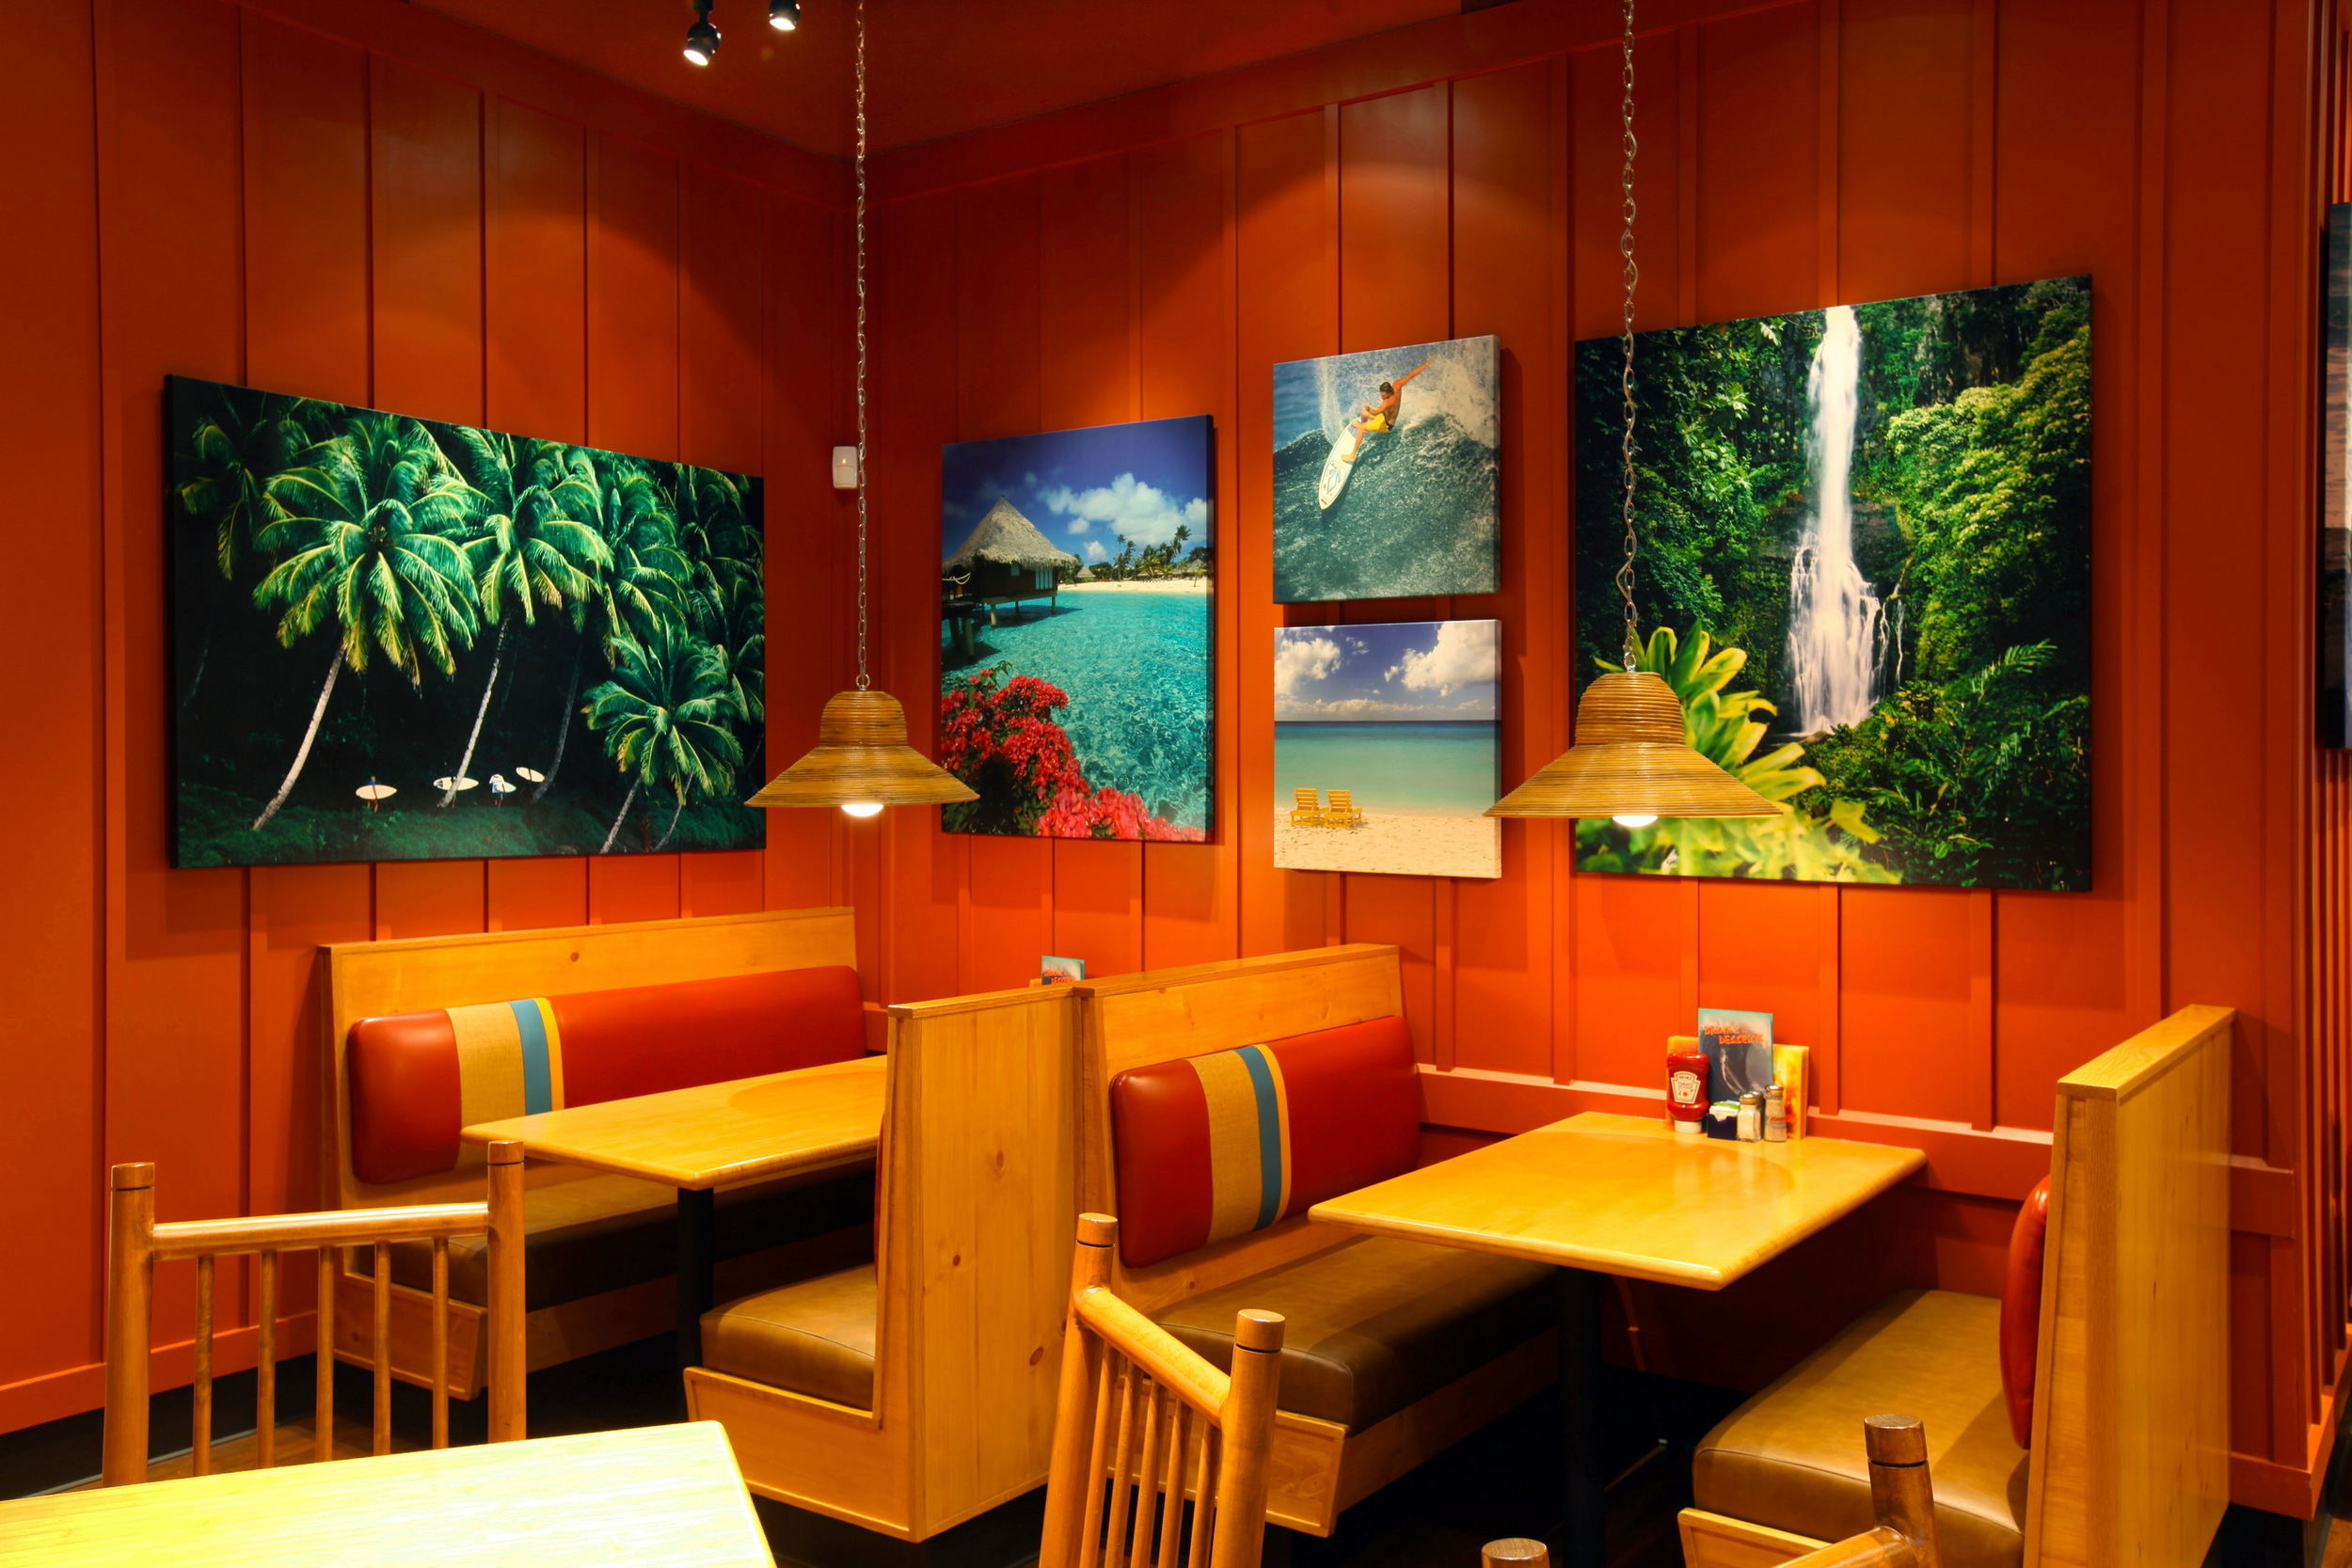 Islands Restaurant